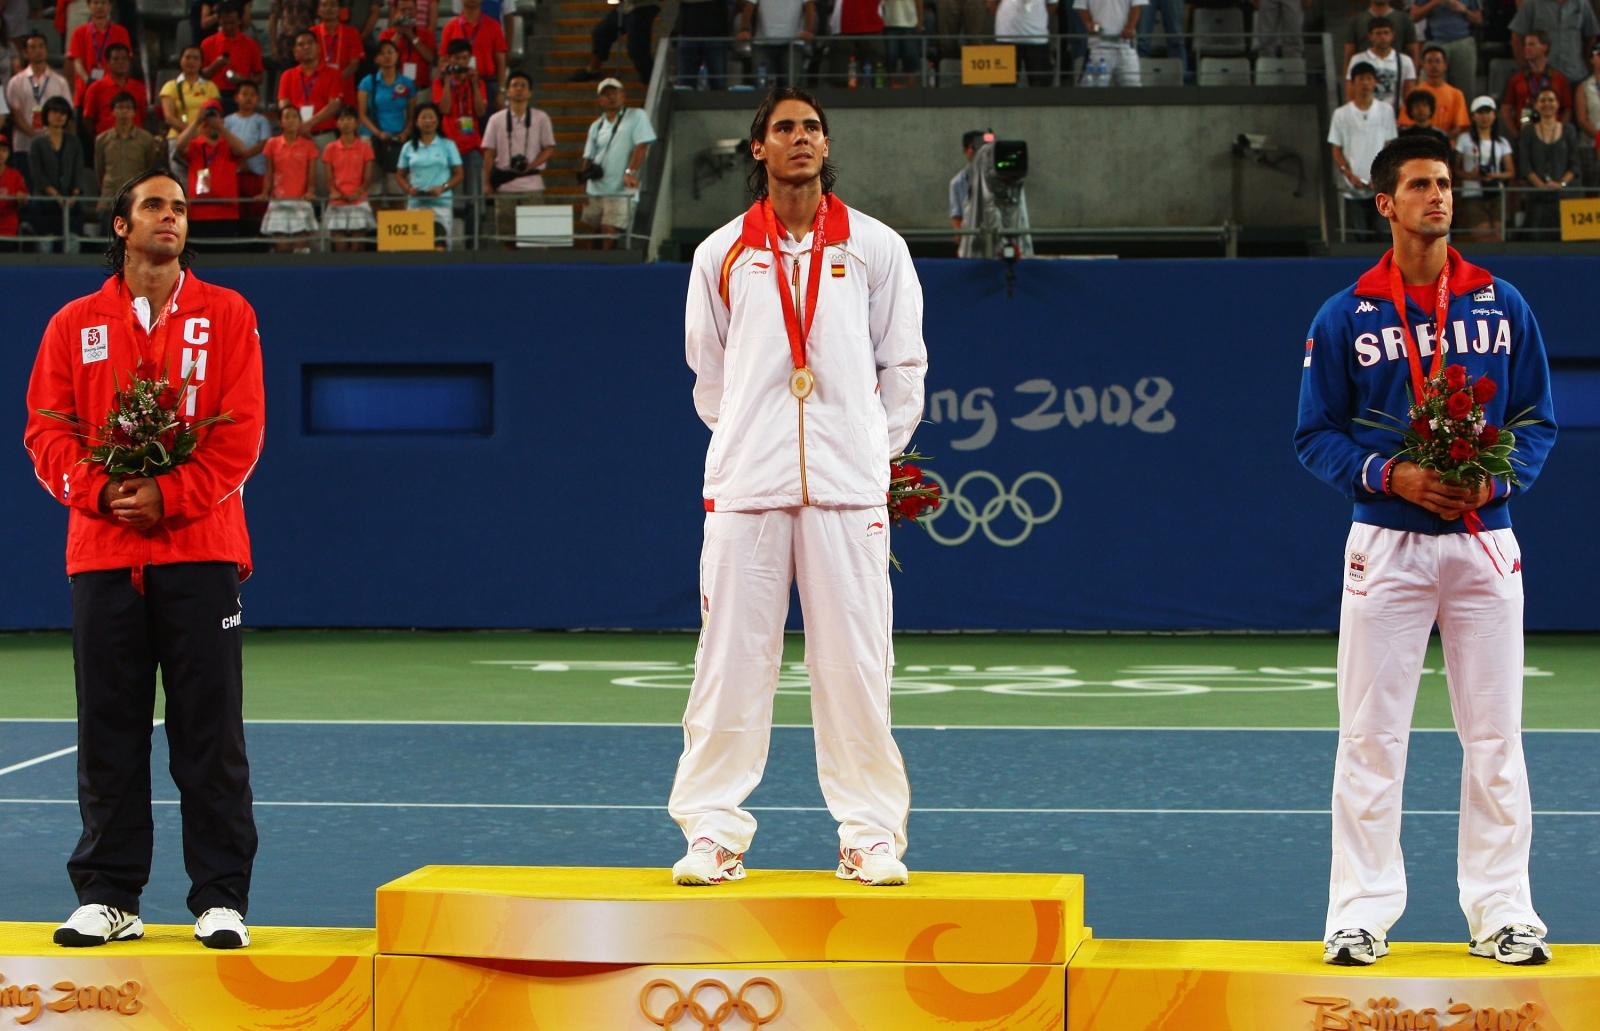 djokovic olympia gold